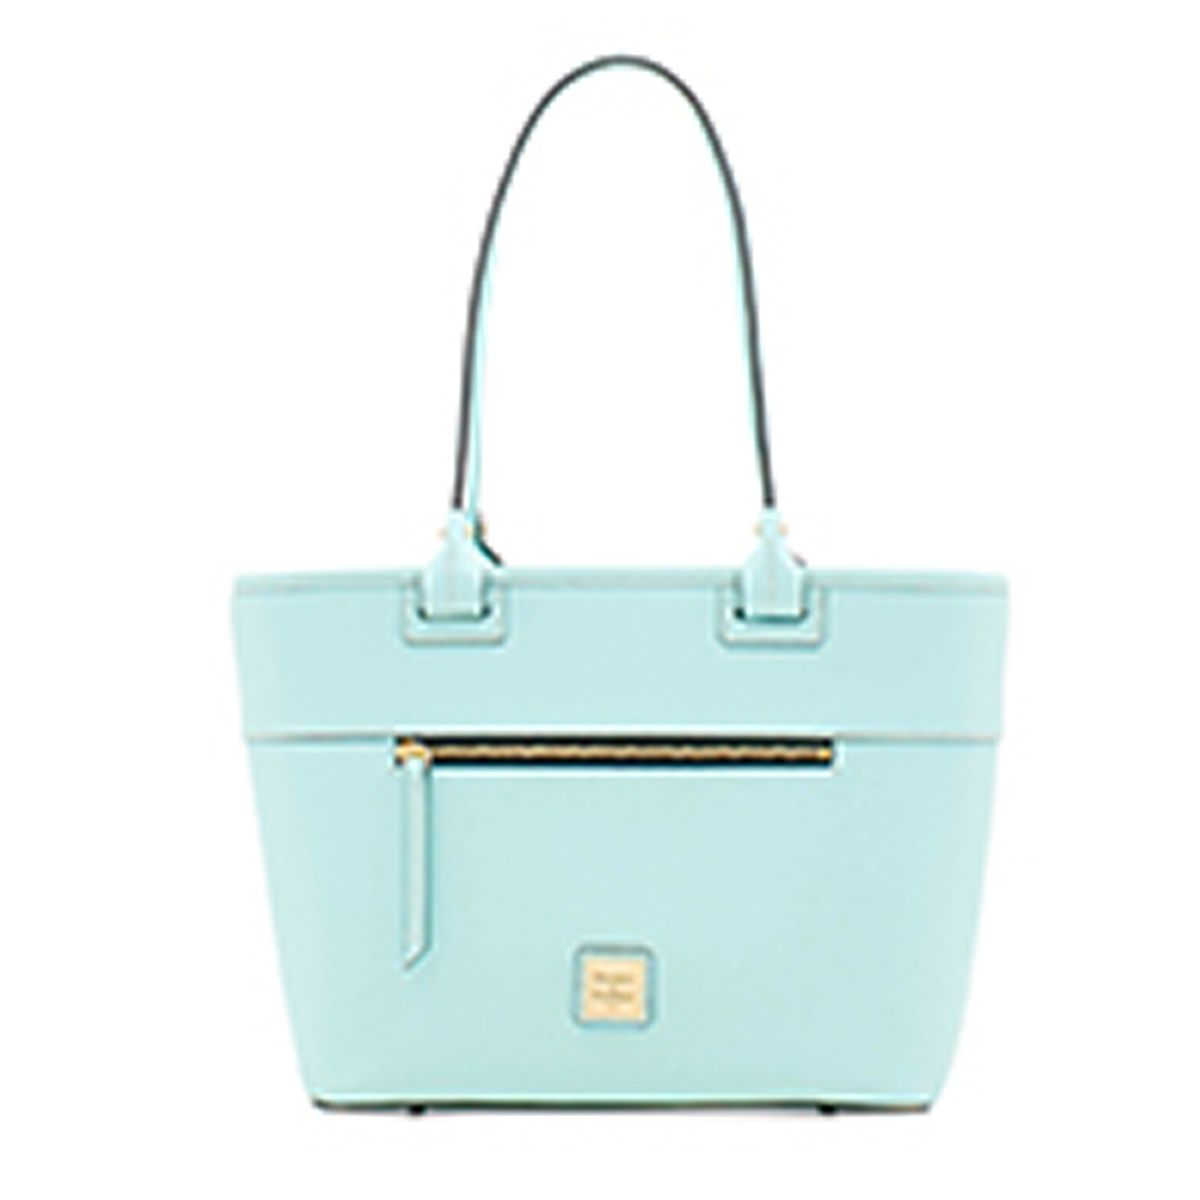 Designer Handbags - Macy s 46dabe396eac4